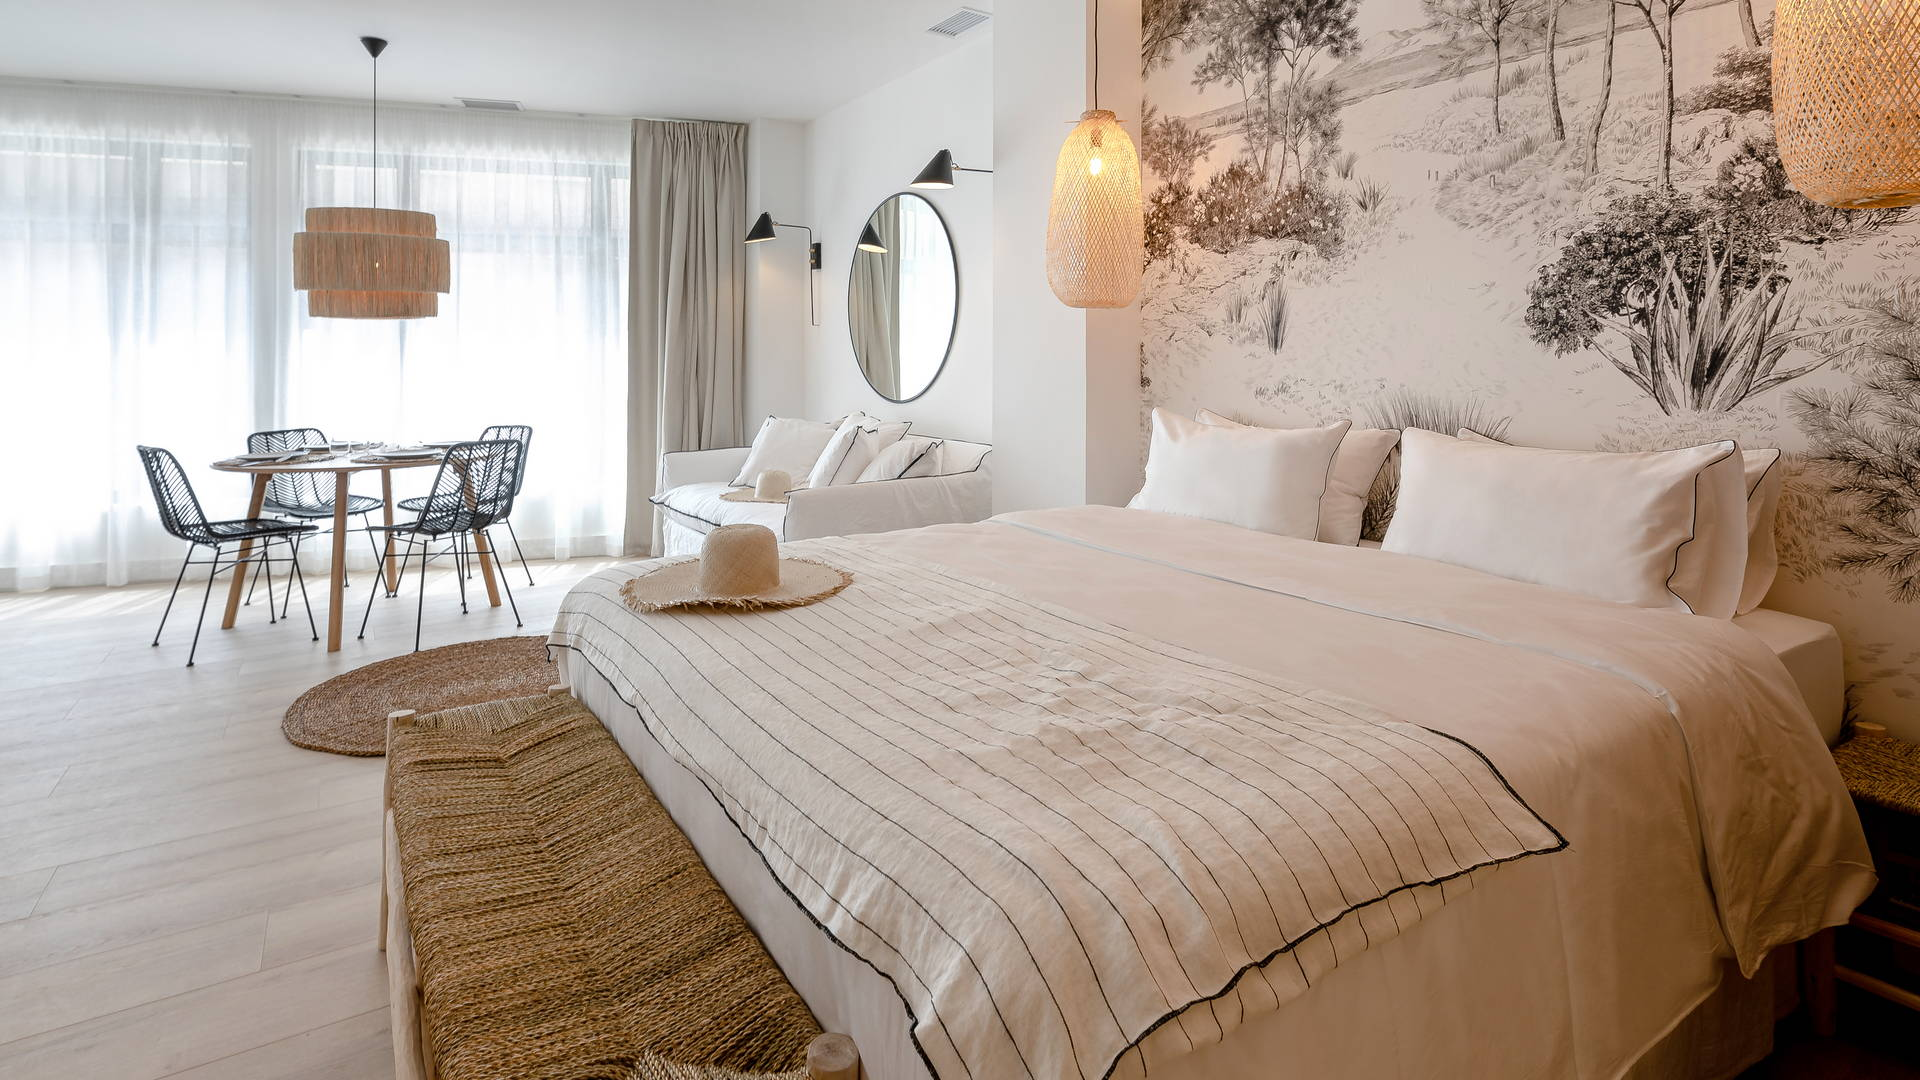 Grand lit confortable hotel bord de mer méditerranée